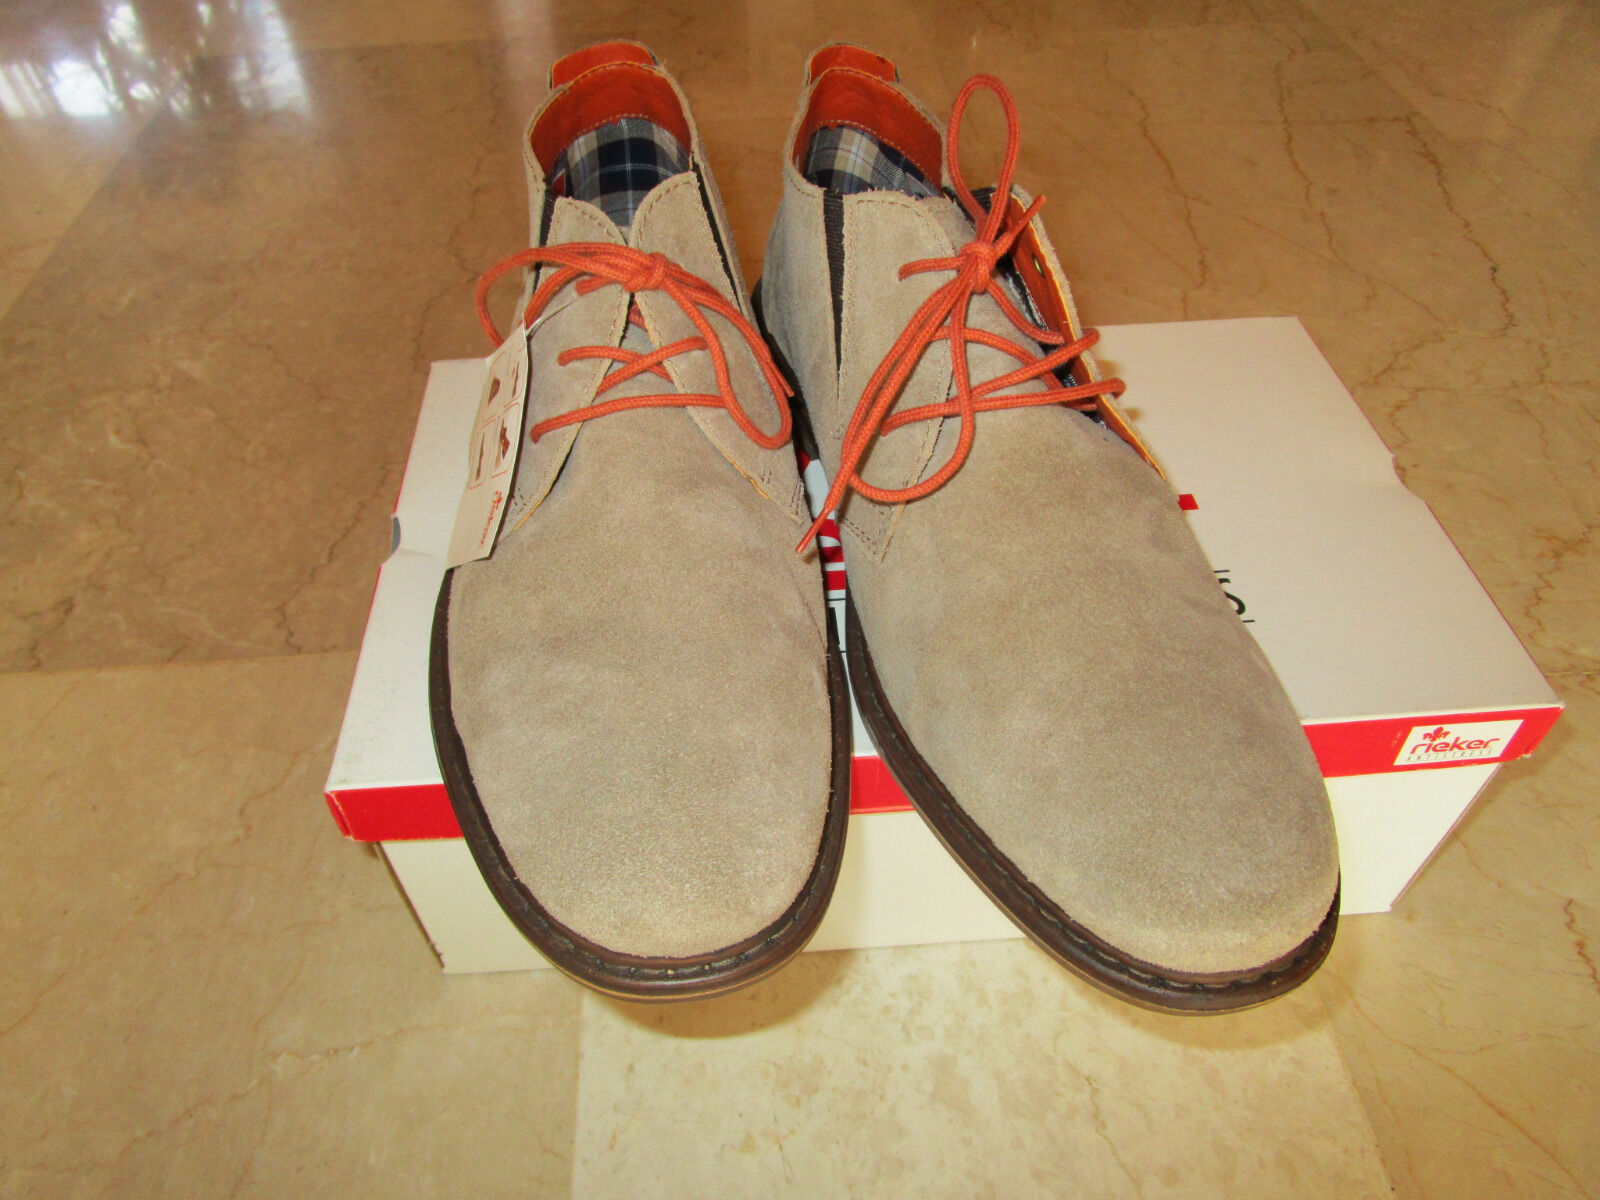 RIEKER Schuhe Leder, Gr.45, beige, Leder, Schuhe neu mit Karton 4833c3